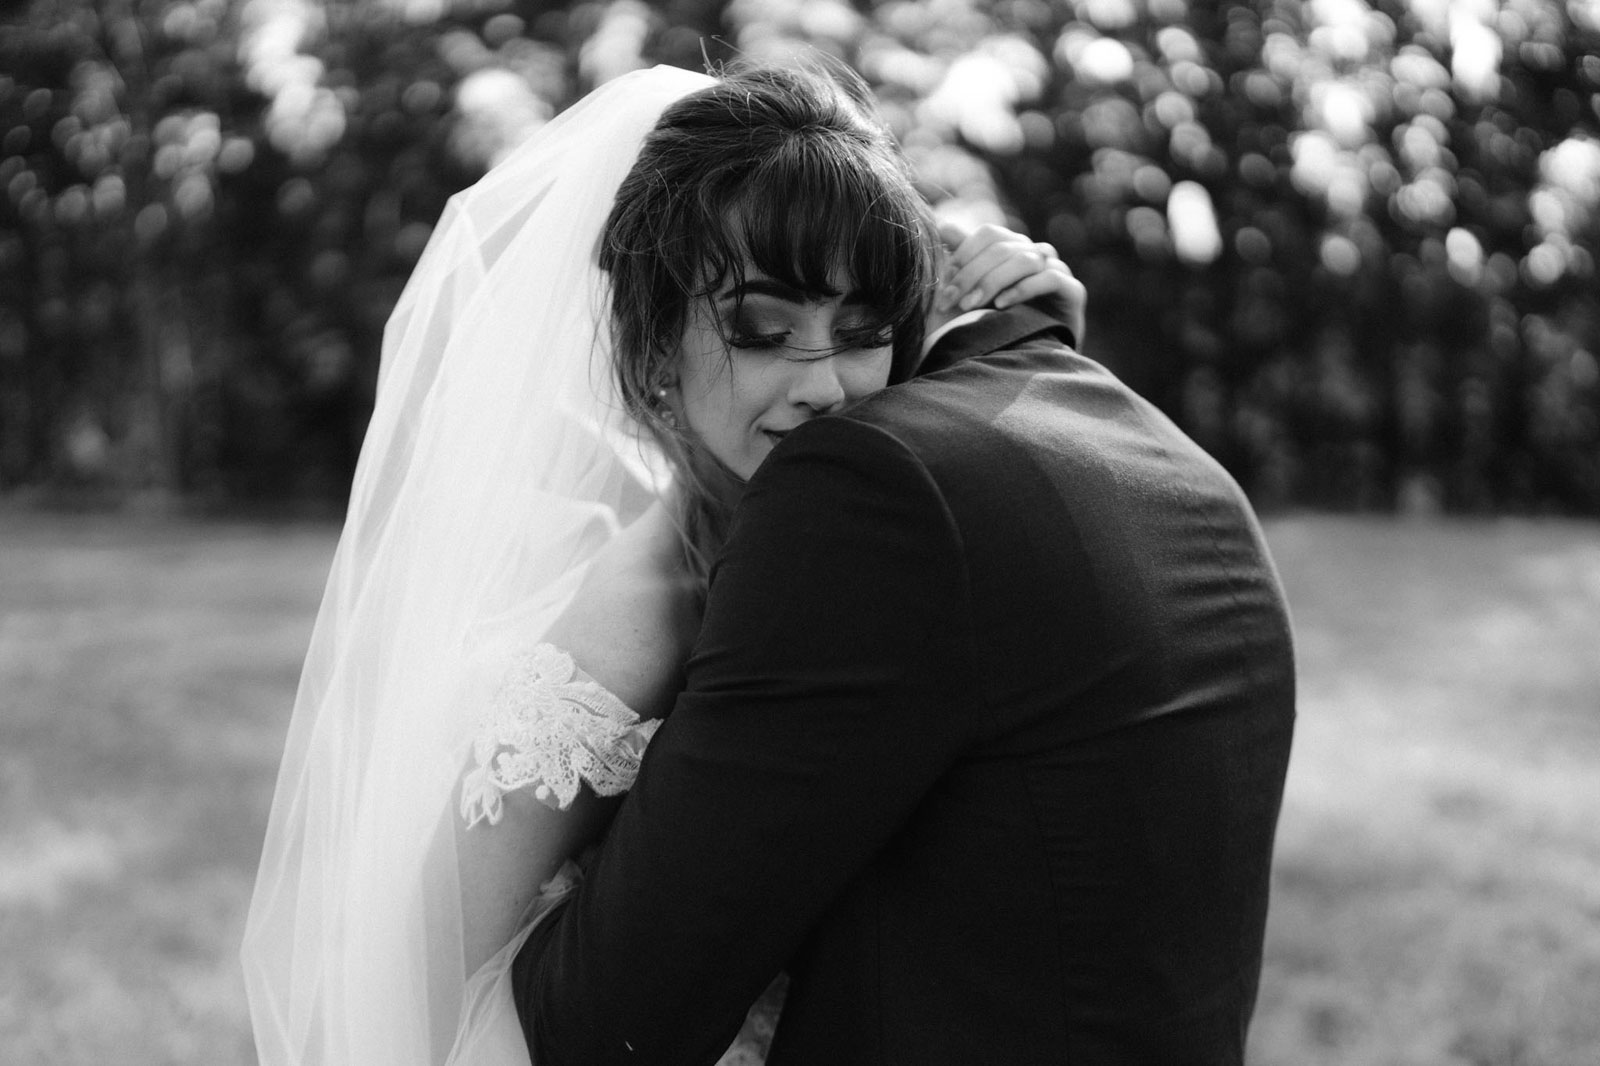 newfound-n-c-olive-tree-cottage-tauranga-wedding-photographer-857